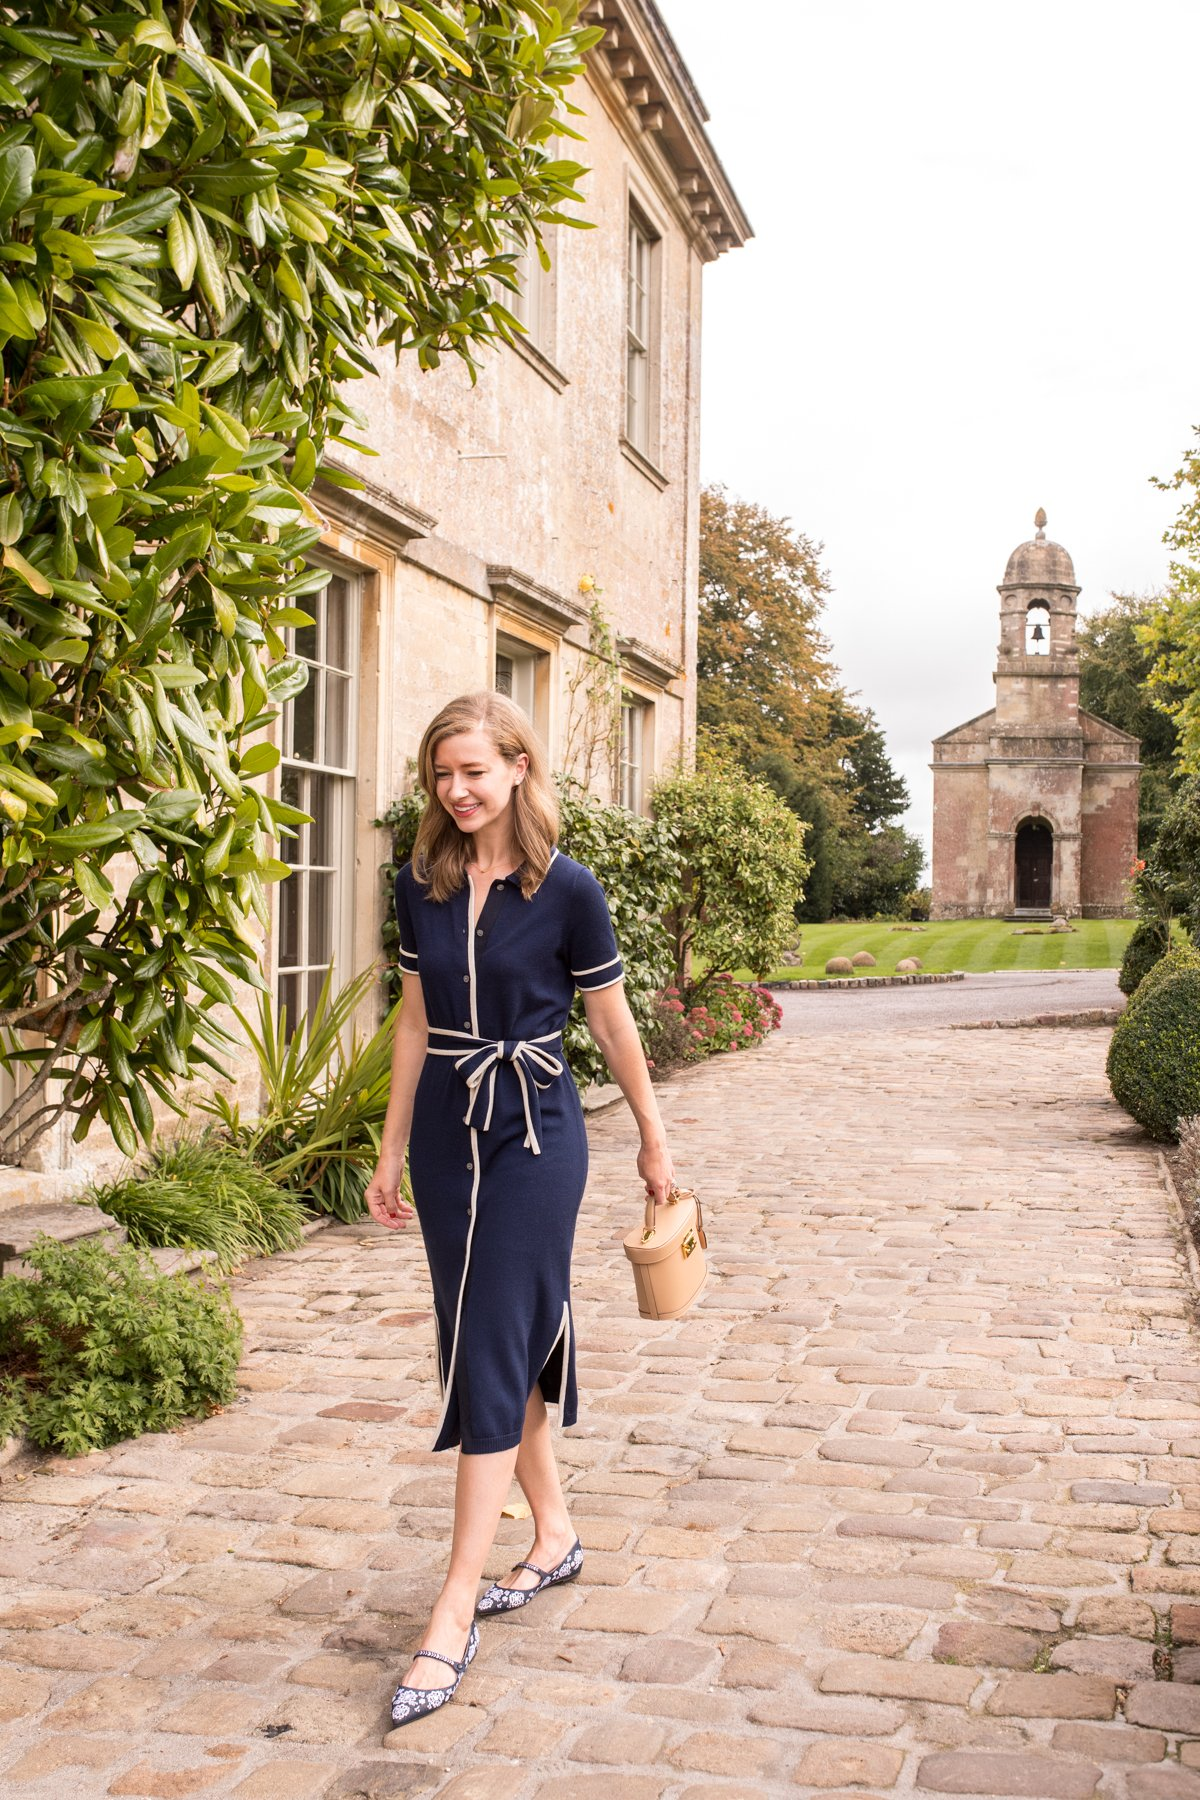 Stacie Flinner Soho House Babington House England-83.jpg